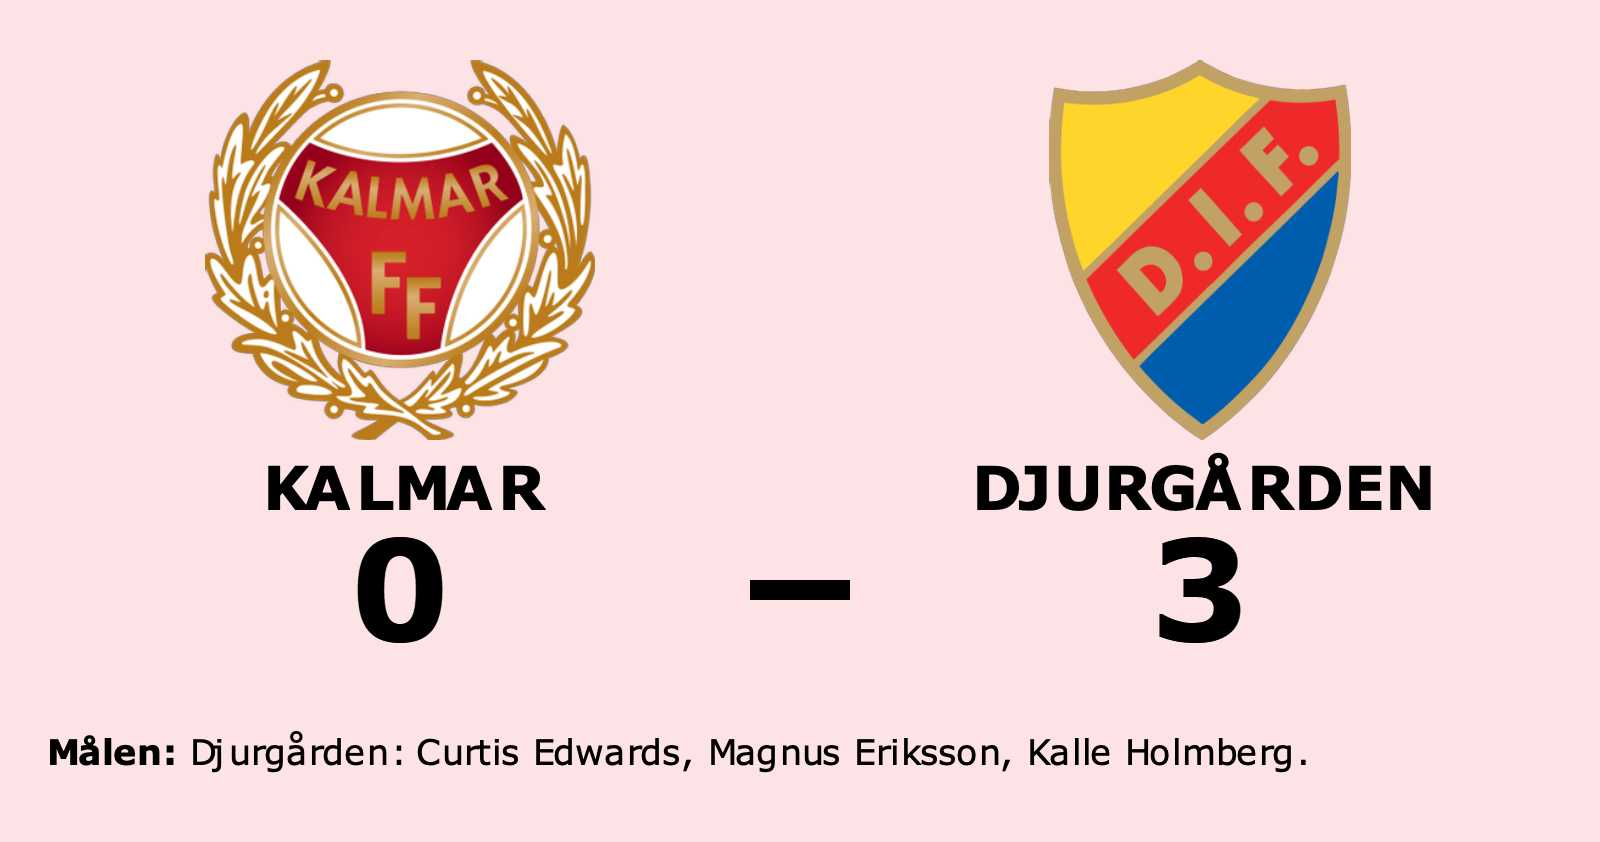 Djurgården vann mot Kalmar